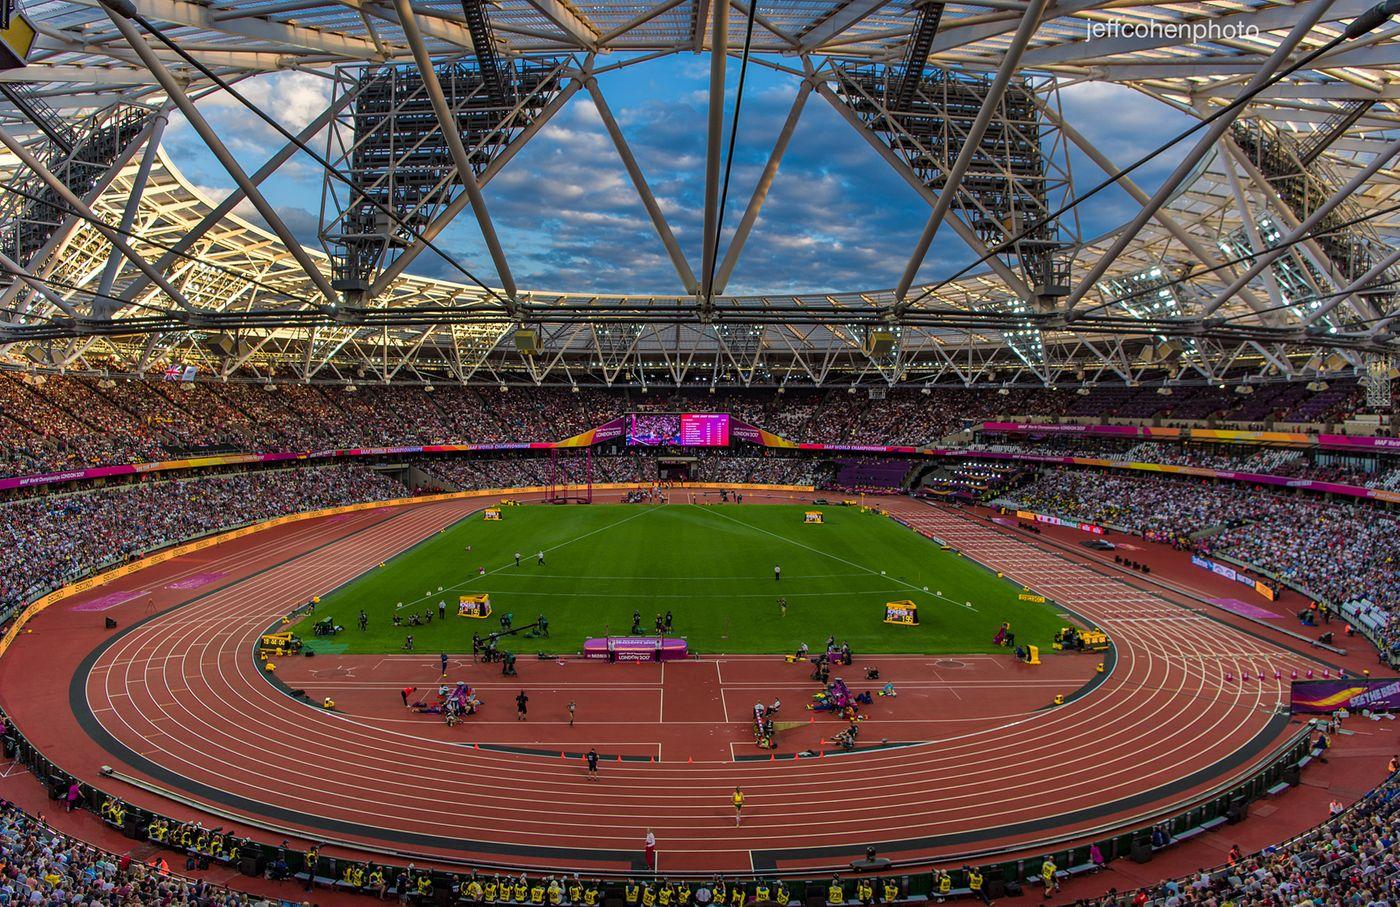 2017-IAAF-WC-London-night-9-stadium--3650--jeff-cohen-photo--web copy.jpg